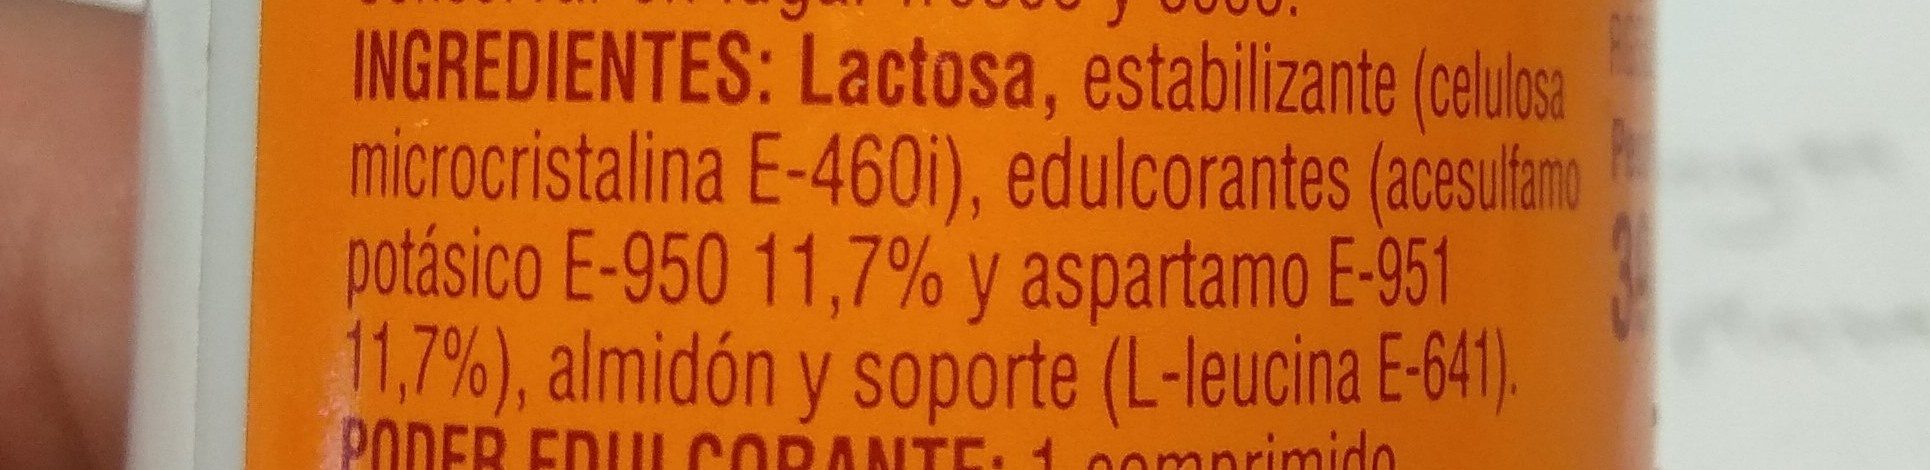 Aspartamo - Ingrédients